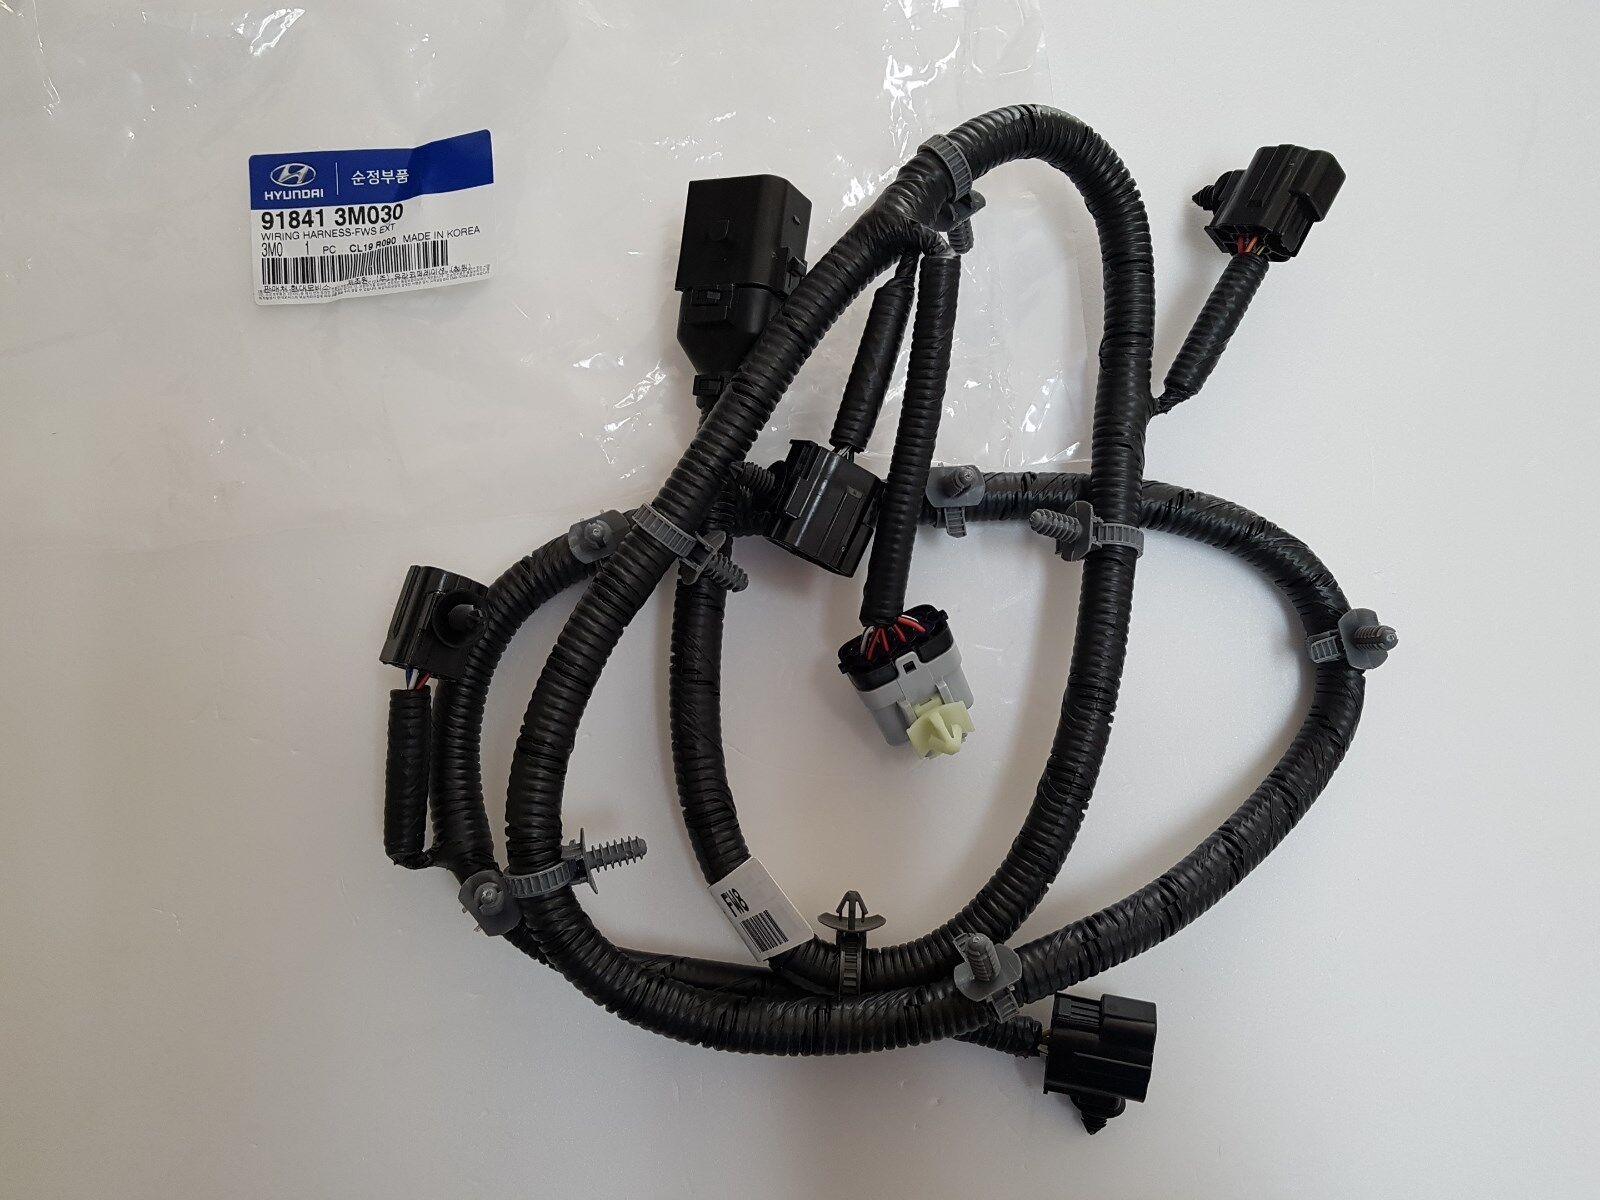 Oem Front Parking Senser Harness 918413m030 For 2009 2014 Hyundai Wiring Genesis Sedan